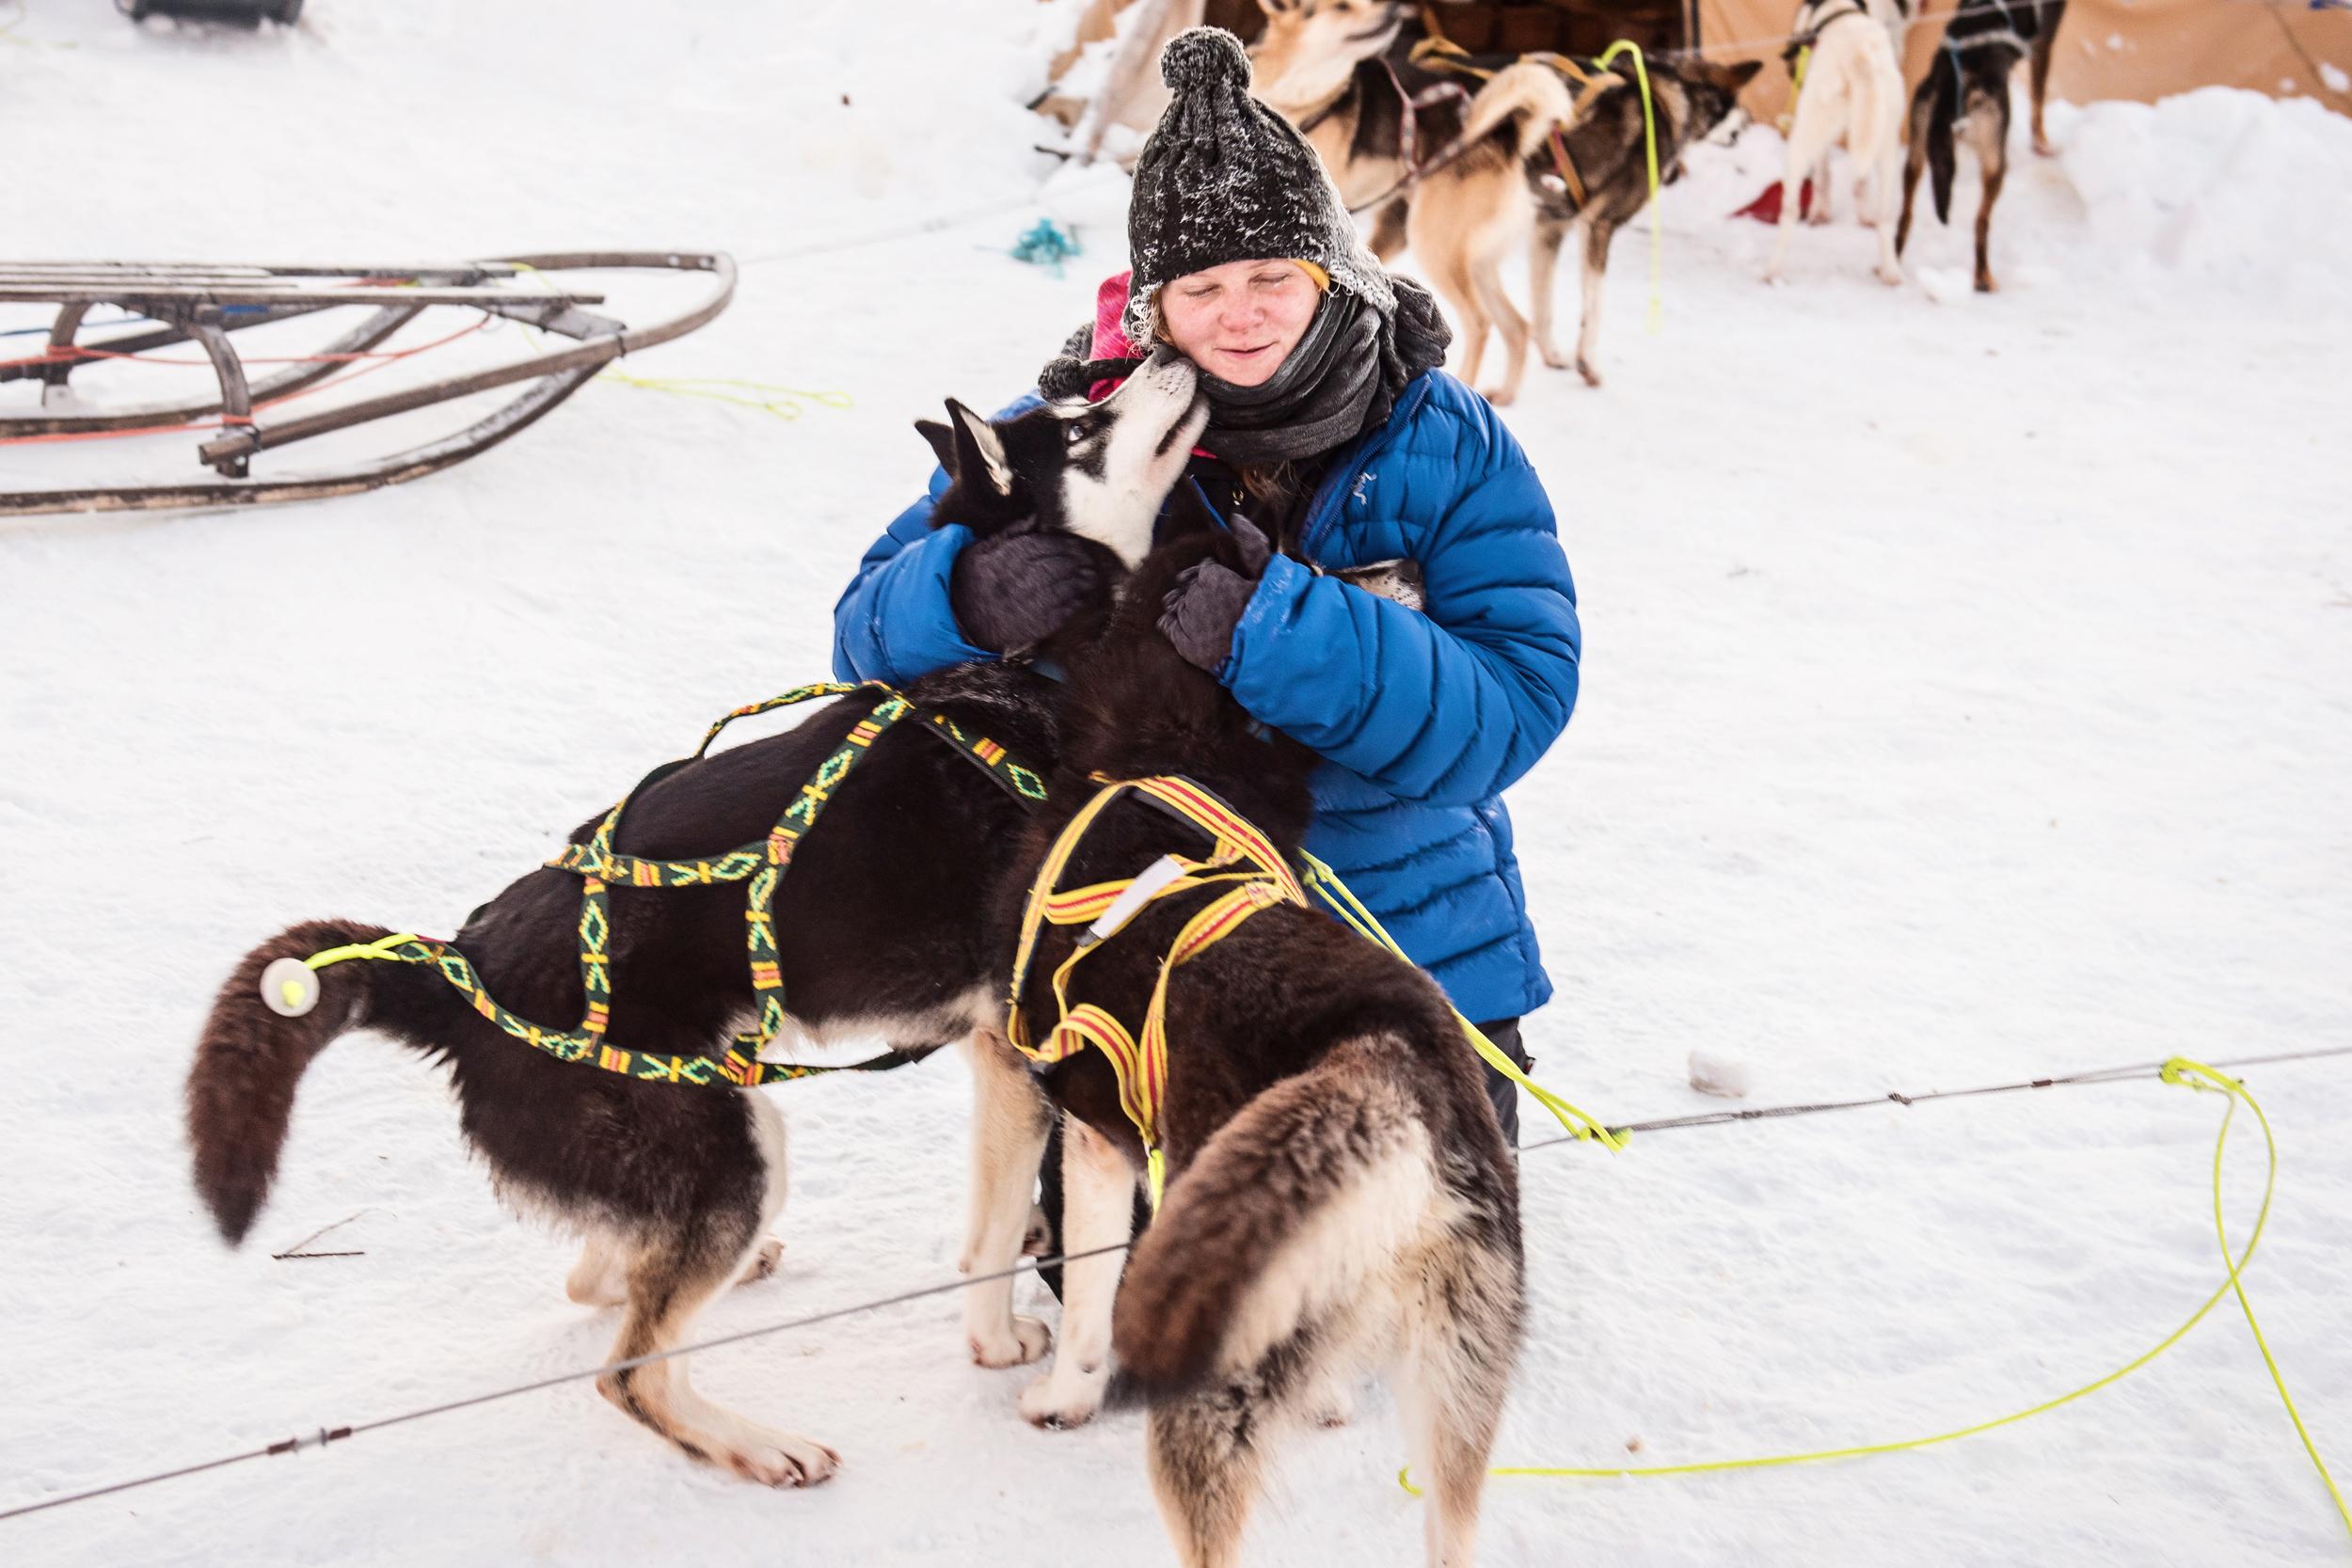 Norway2015-KathleenHertelPhotography-521.JPG